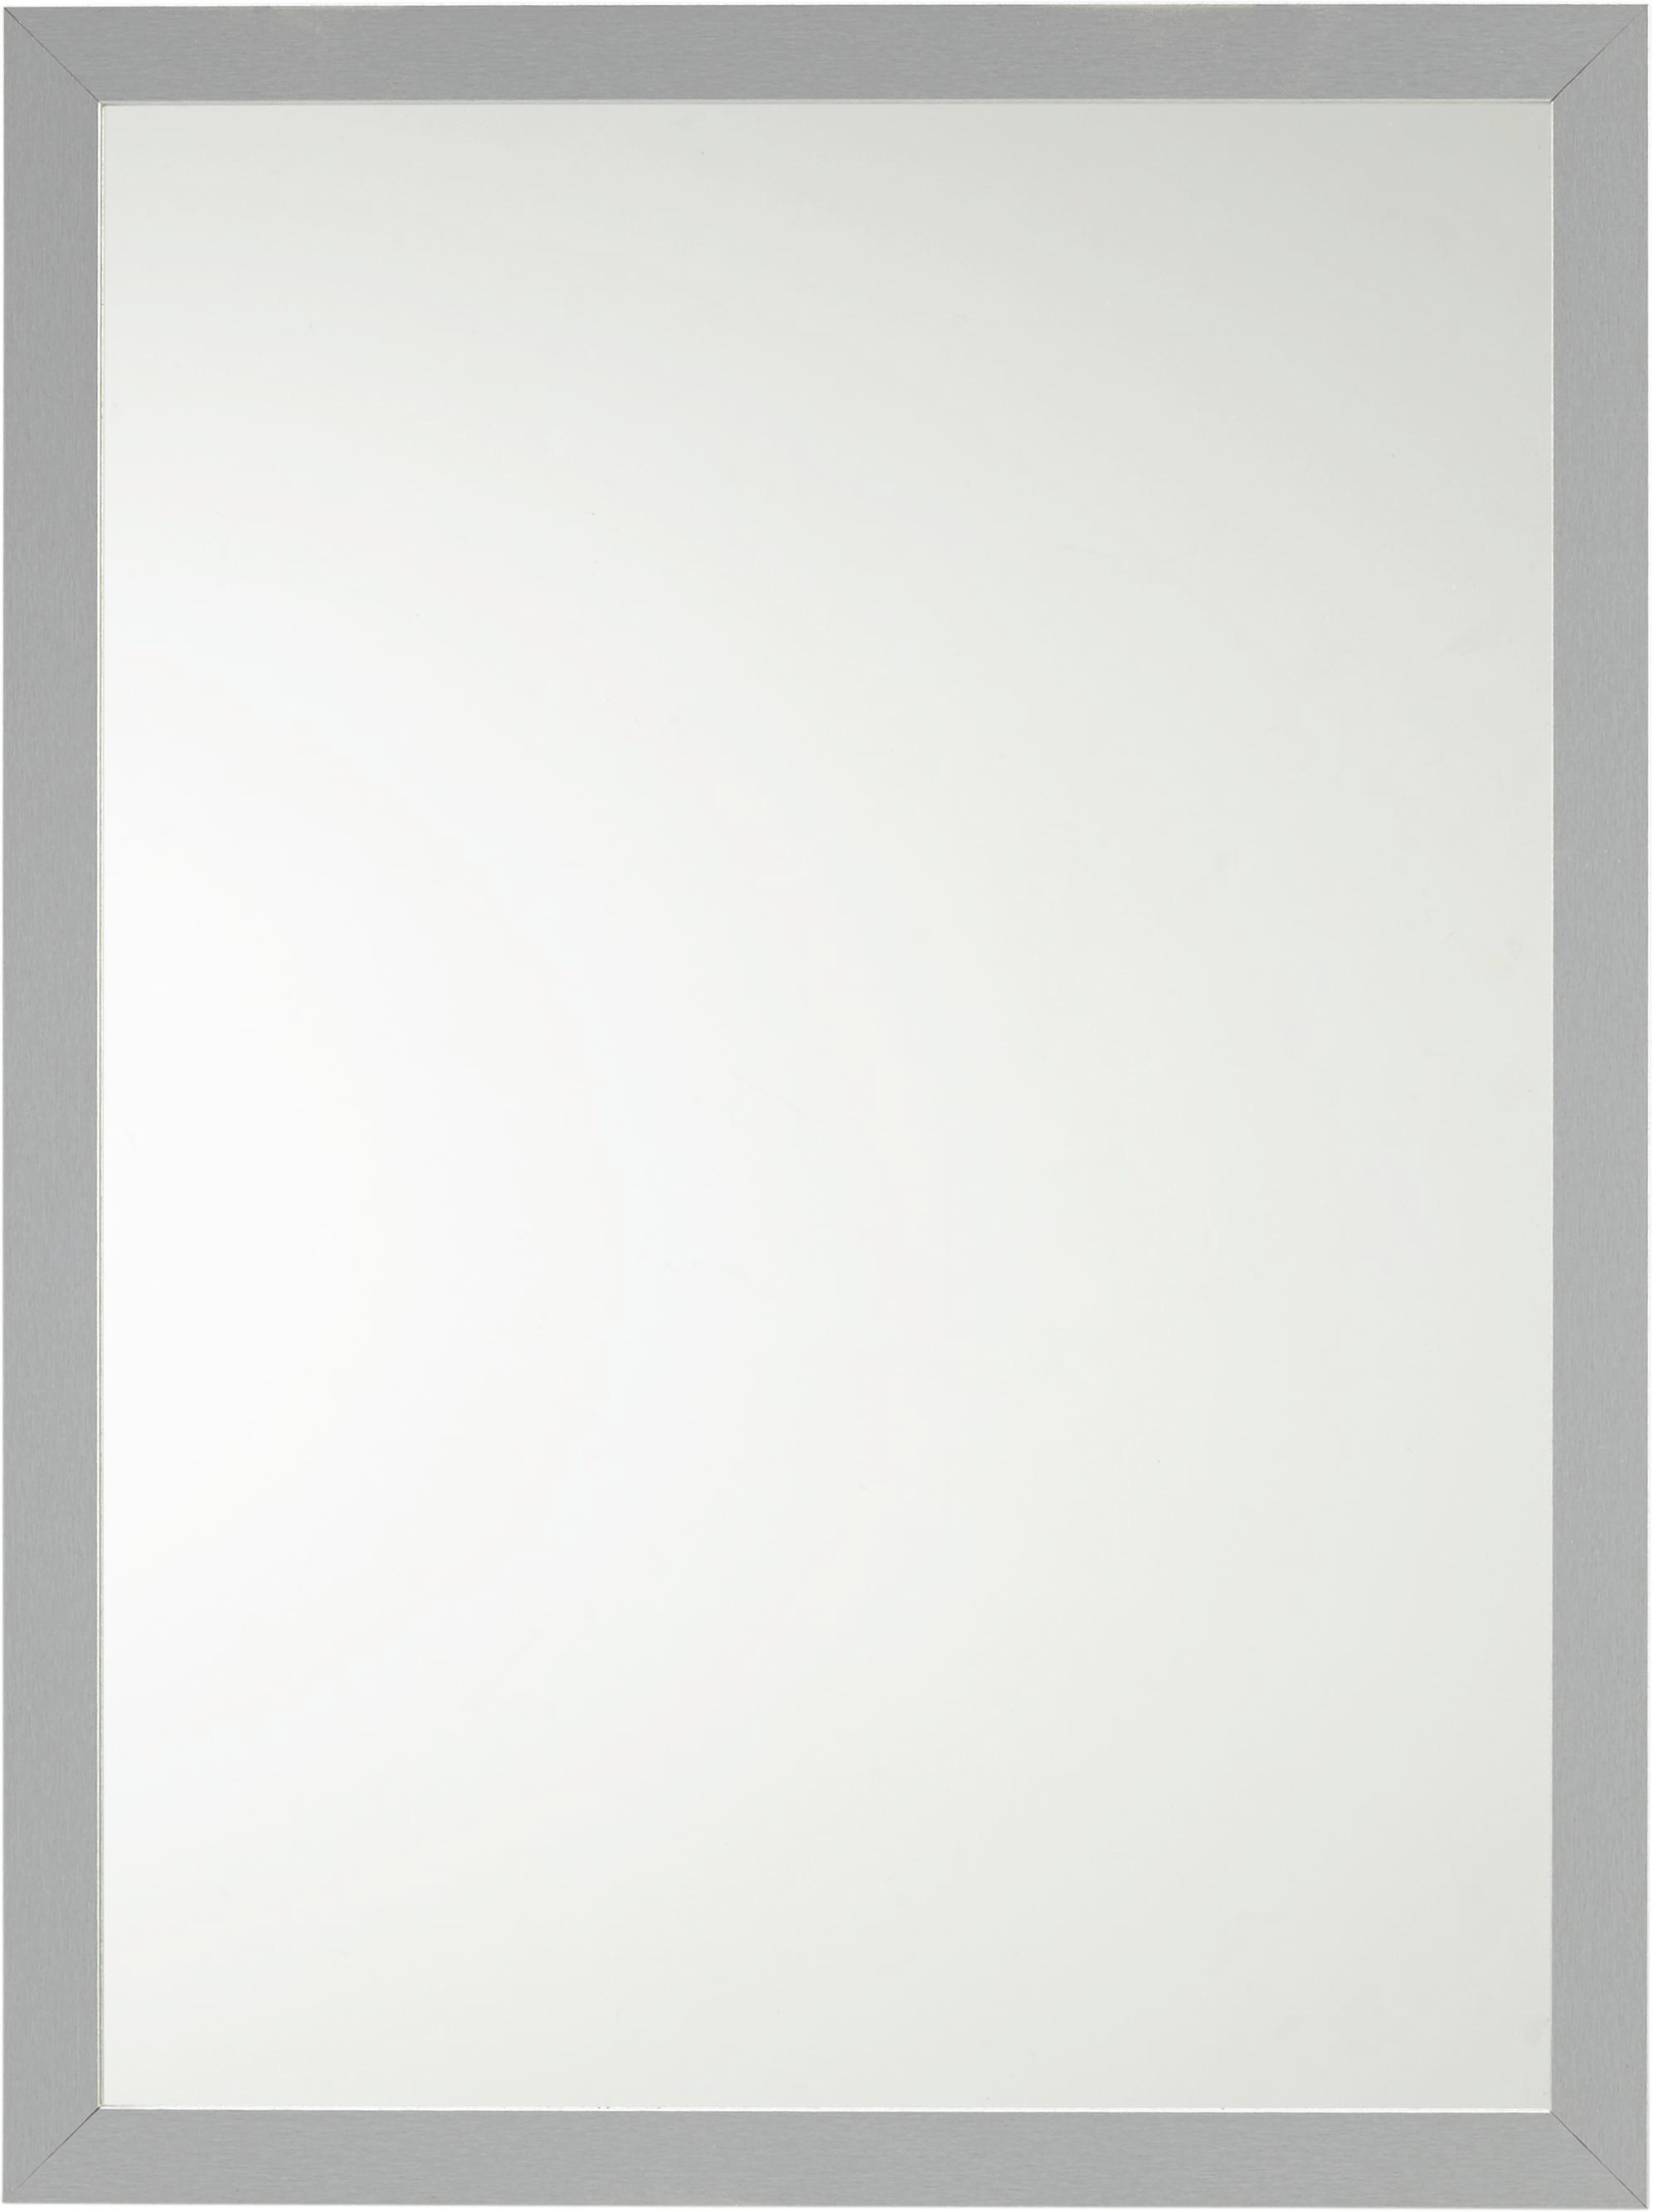 Wandspiegel ca. 60x80x2cm - Silberfarben, Glas/Holzwerkstoff (60/80/2cm) - MÖMAX modern living